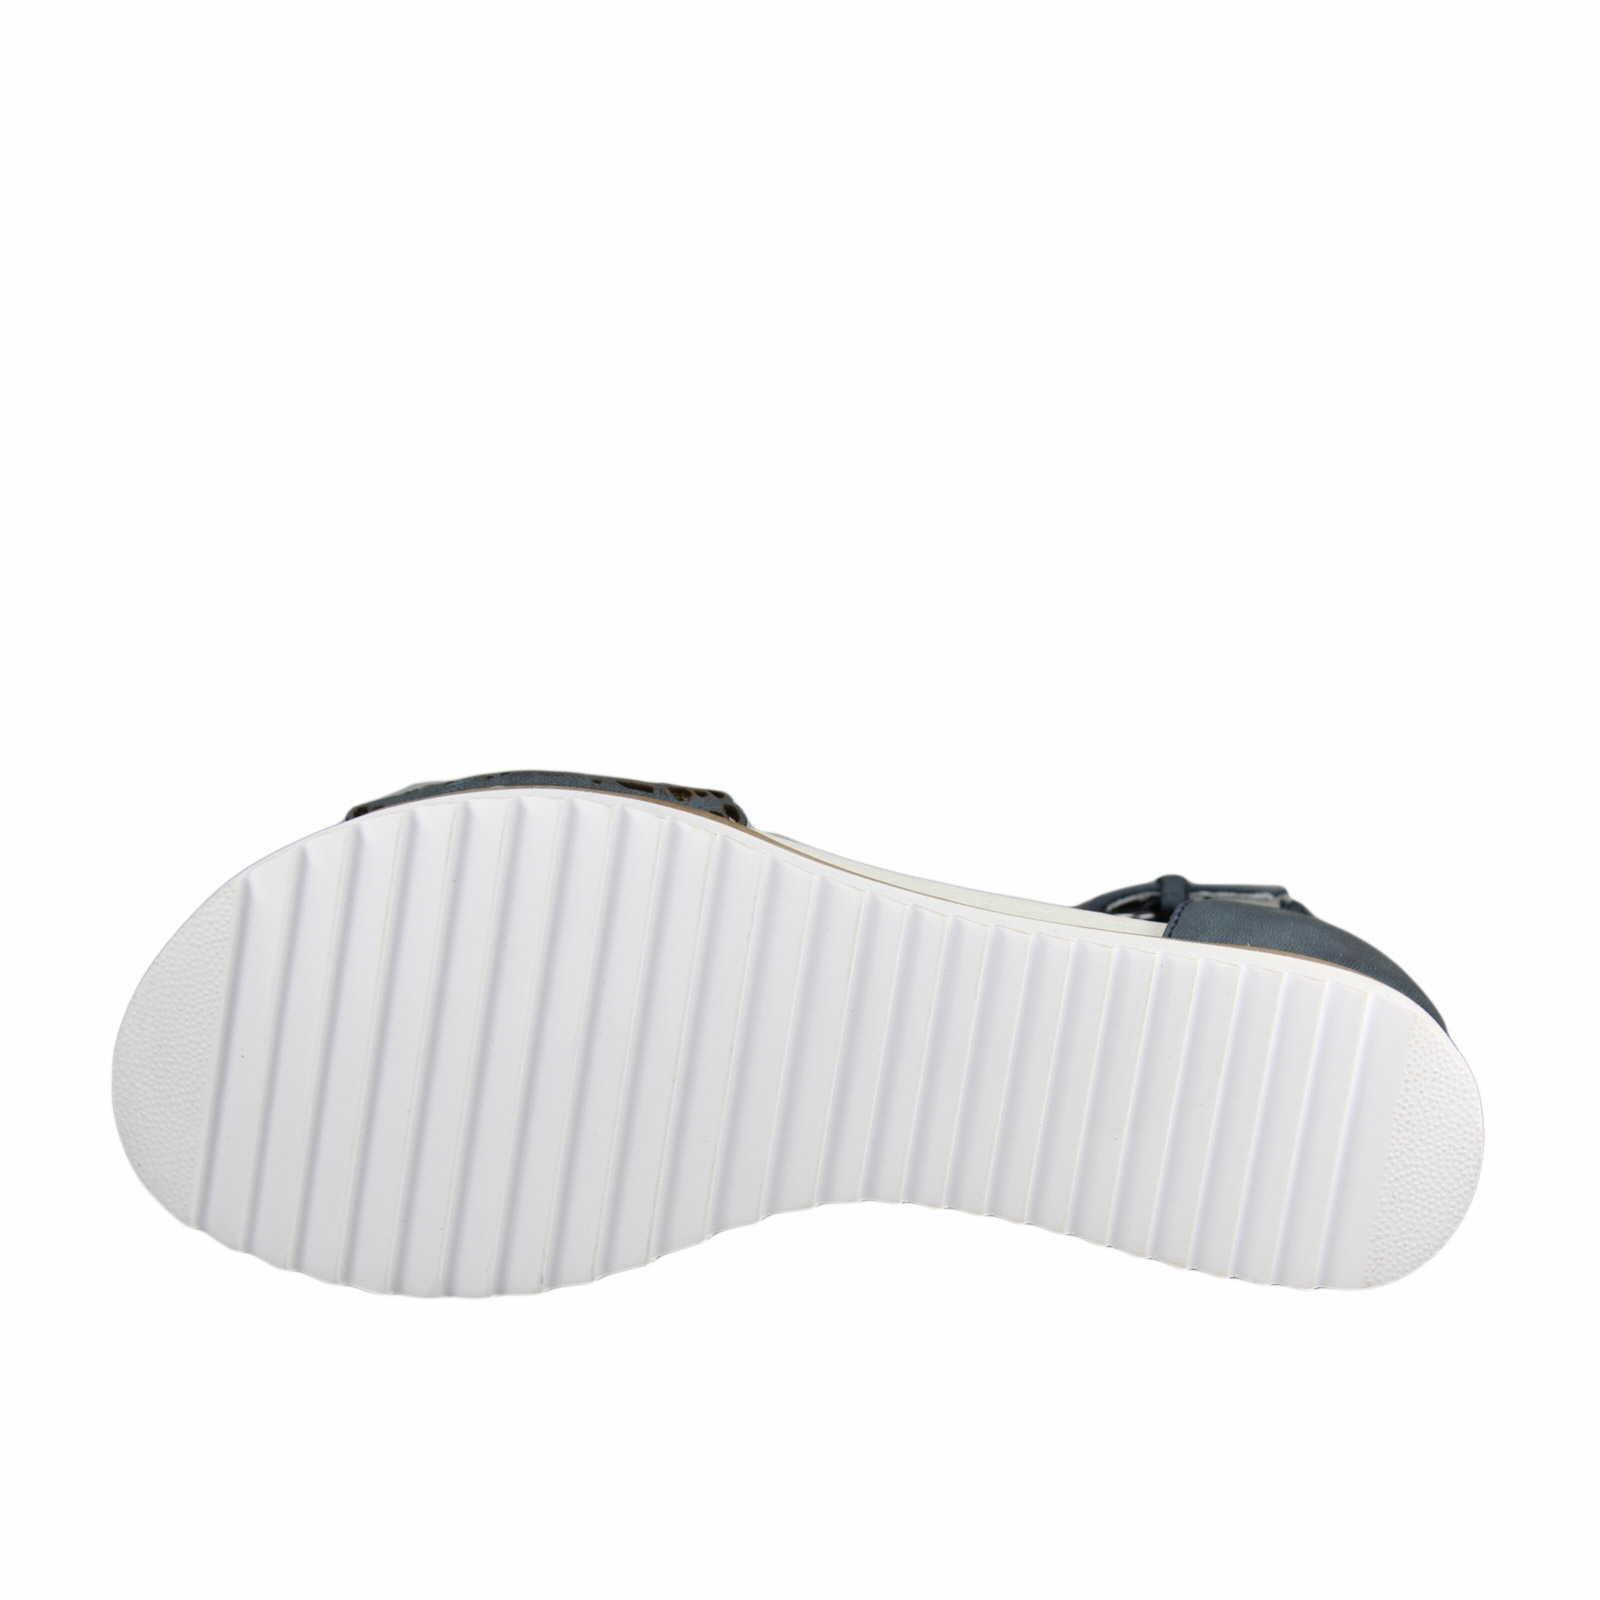 gerry weber shoes blau bianca 04 g46204 818 506 schuhparadies online shop schuhe einfach. Black Bedroom Furniture Sets. Home Design Ideas